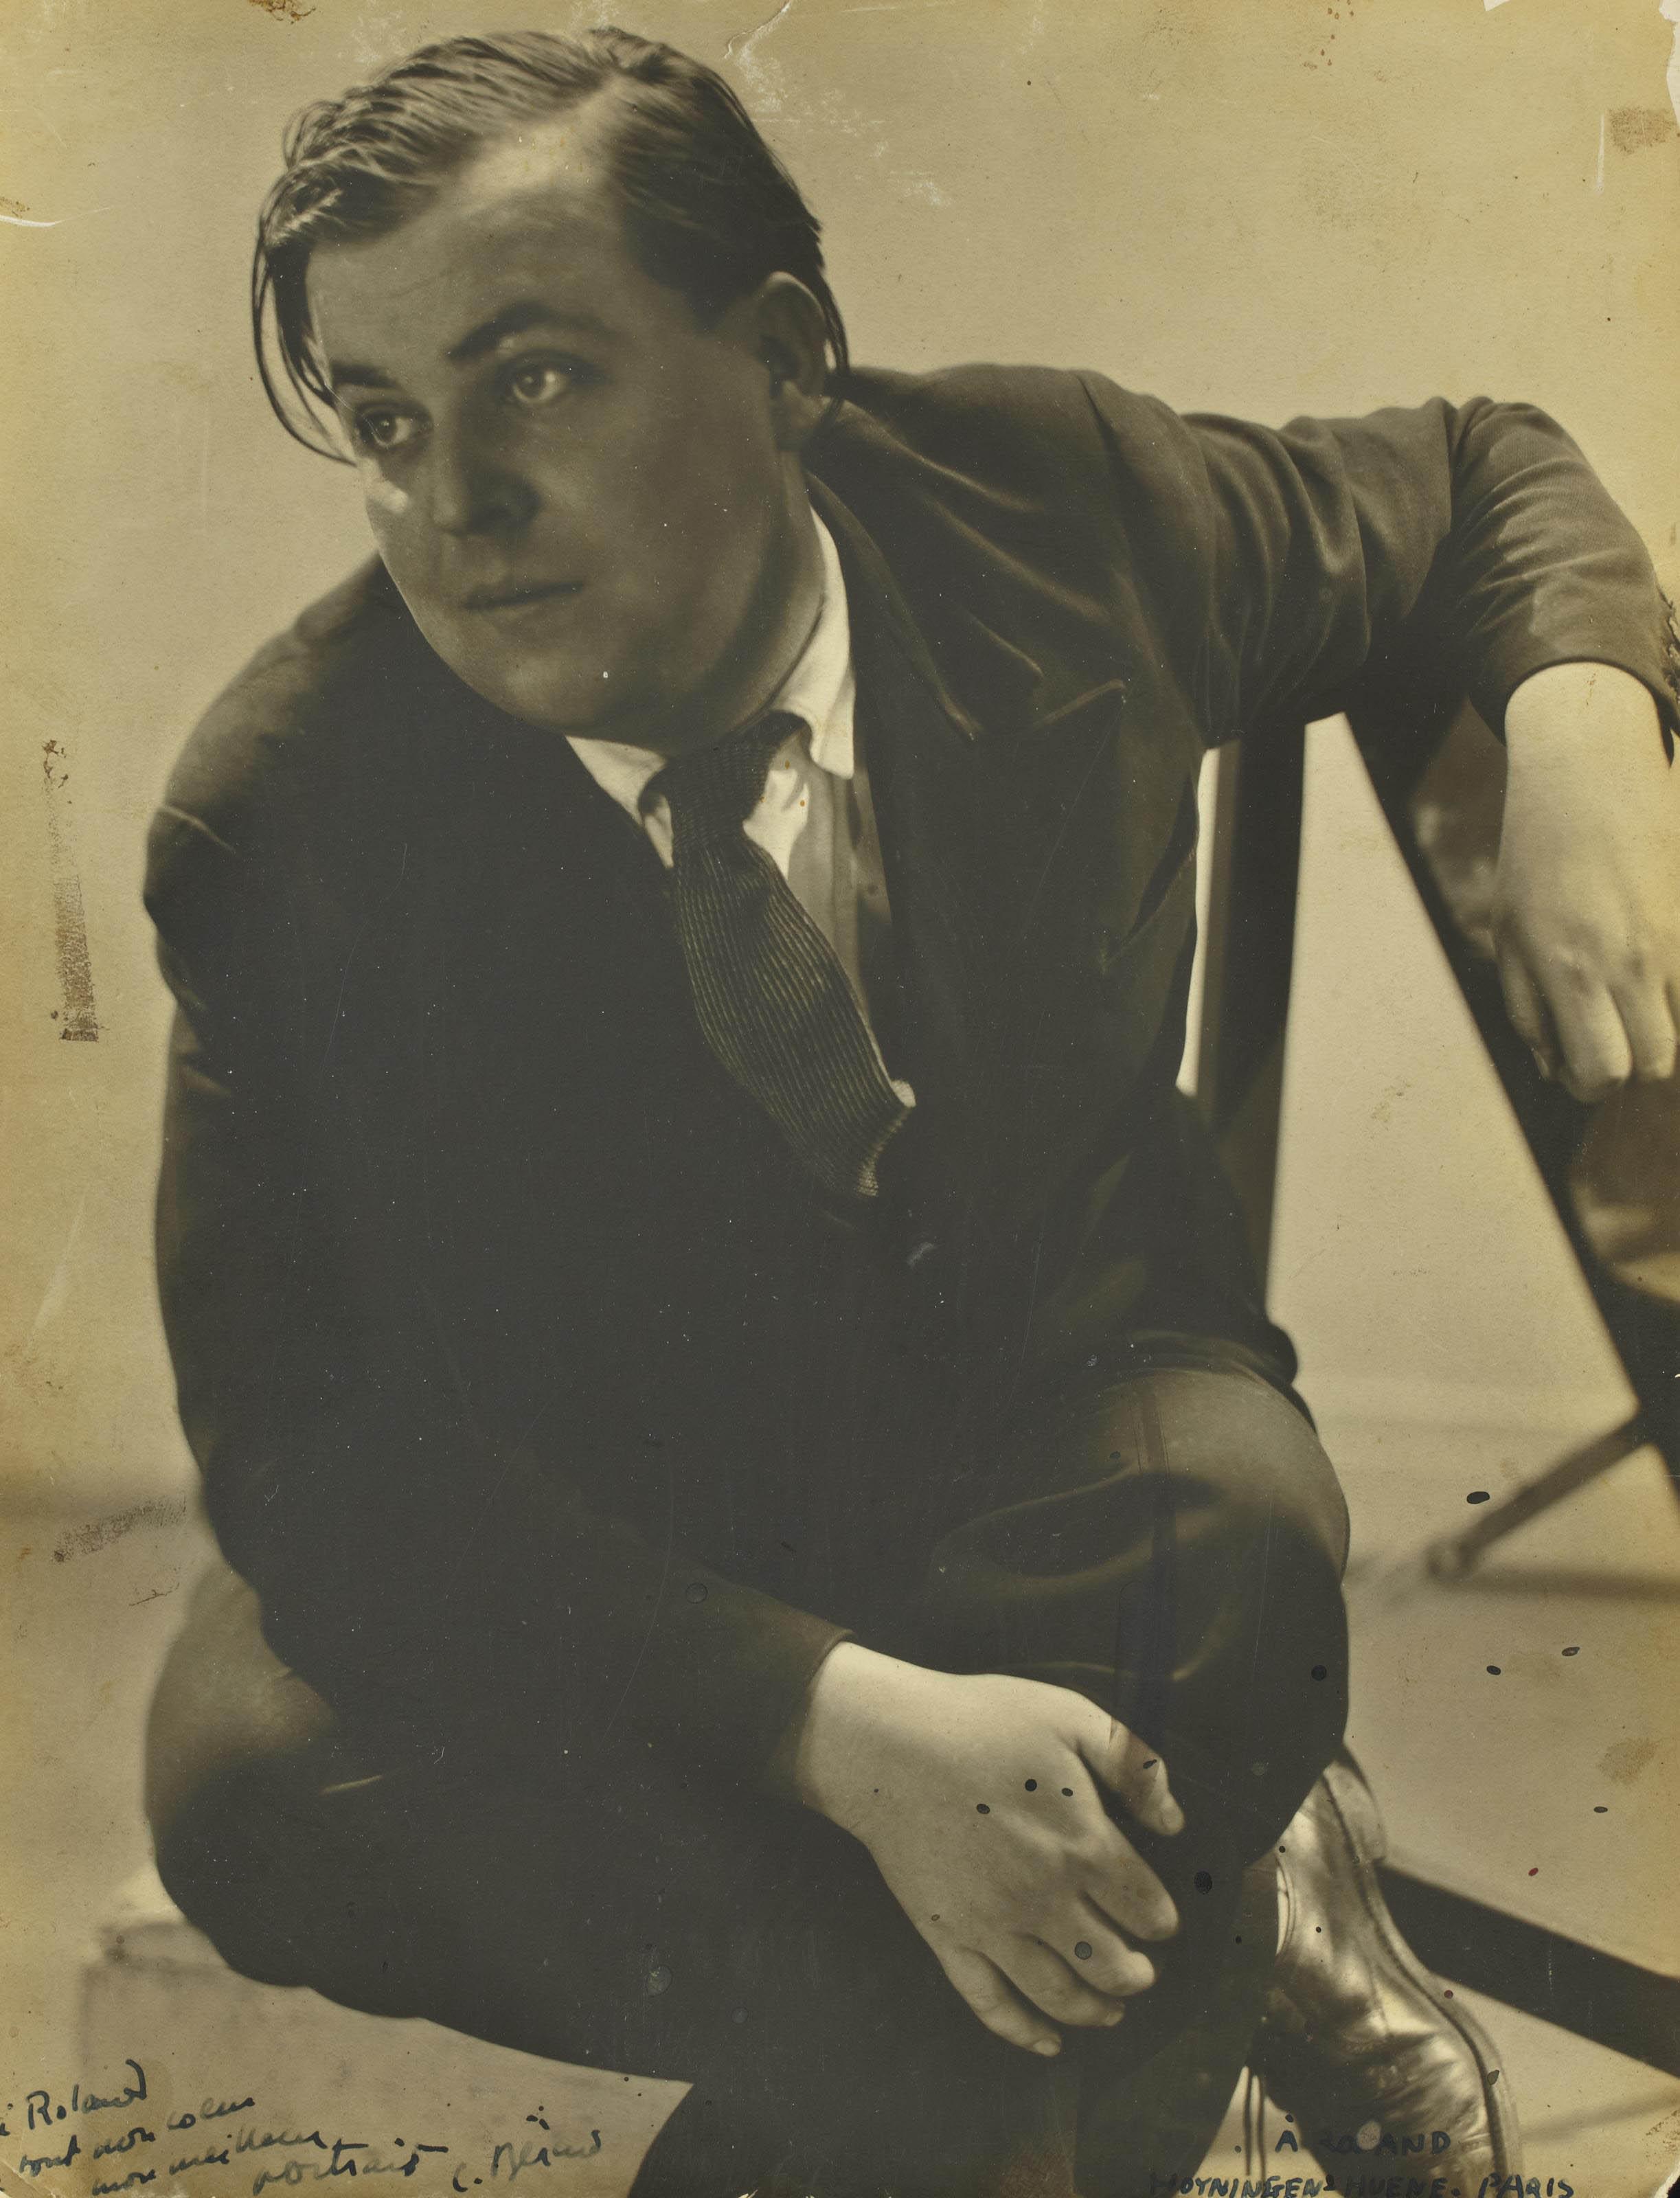 GEORGE HOYNINGEN-HUENE (1900-1